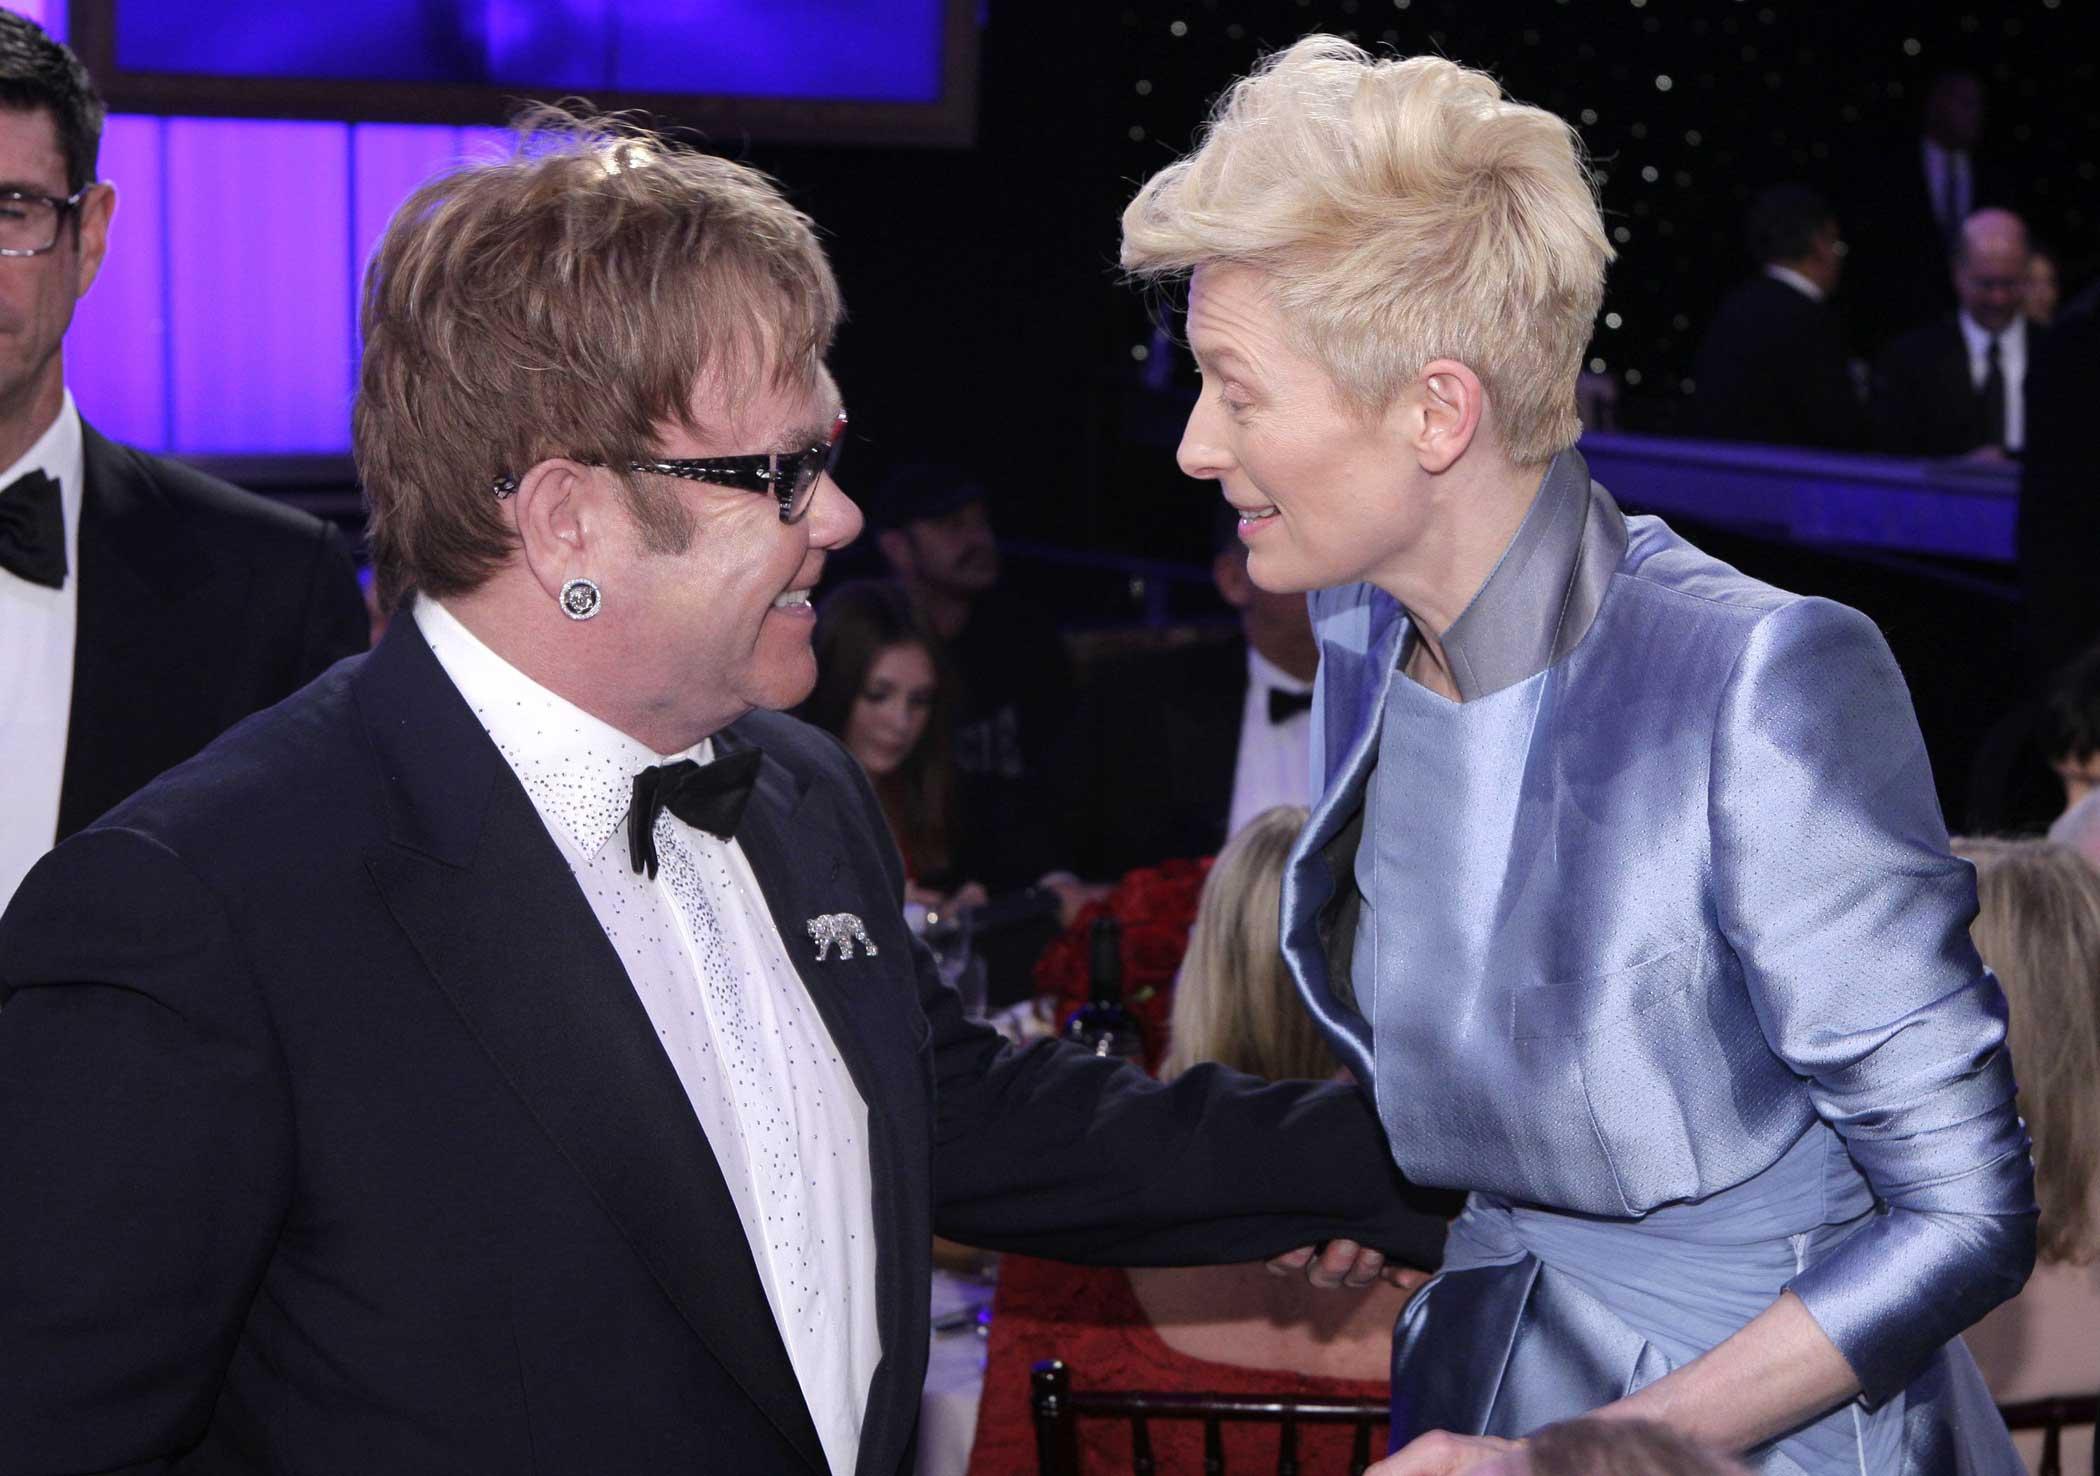 Elton John and Tilda Swinton during the 69th Annual Golden Globe Awards on Jan. 15, 2012 in Beverly Hills, Calif.